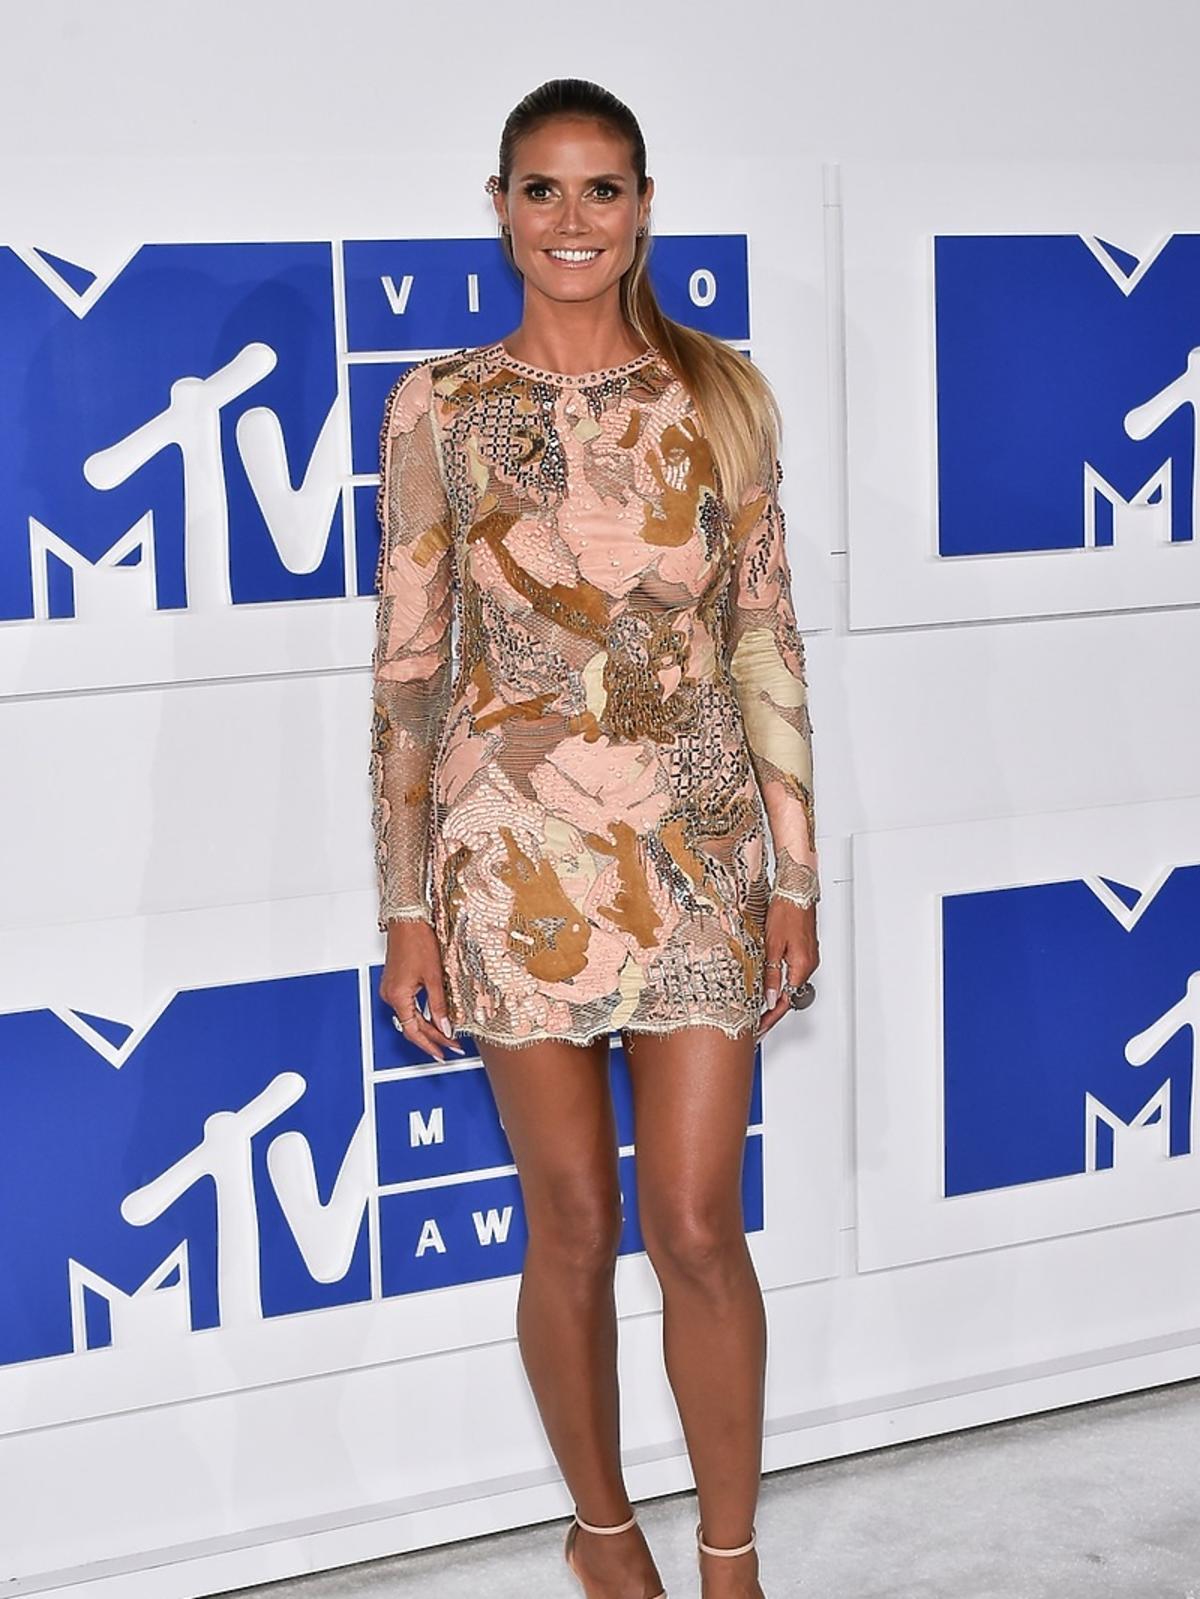 Gala MTV Video Music Awards 2016 Heidi Klum